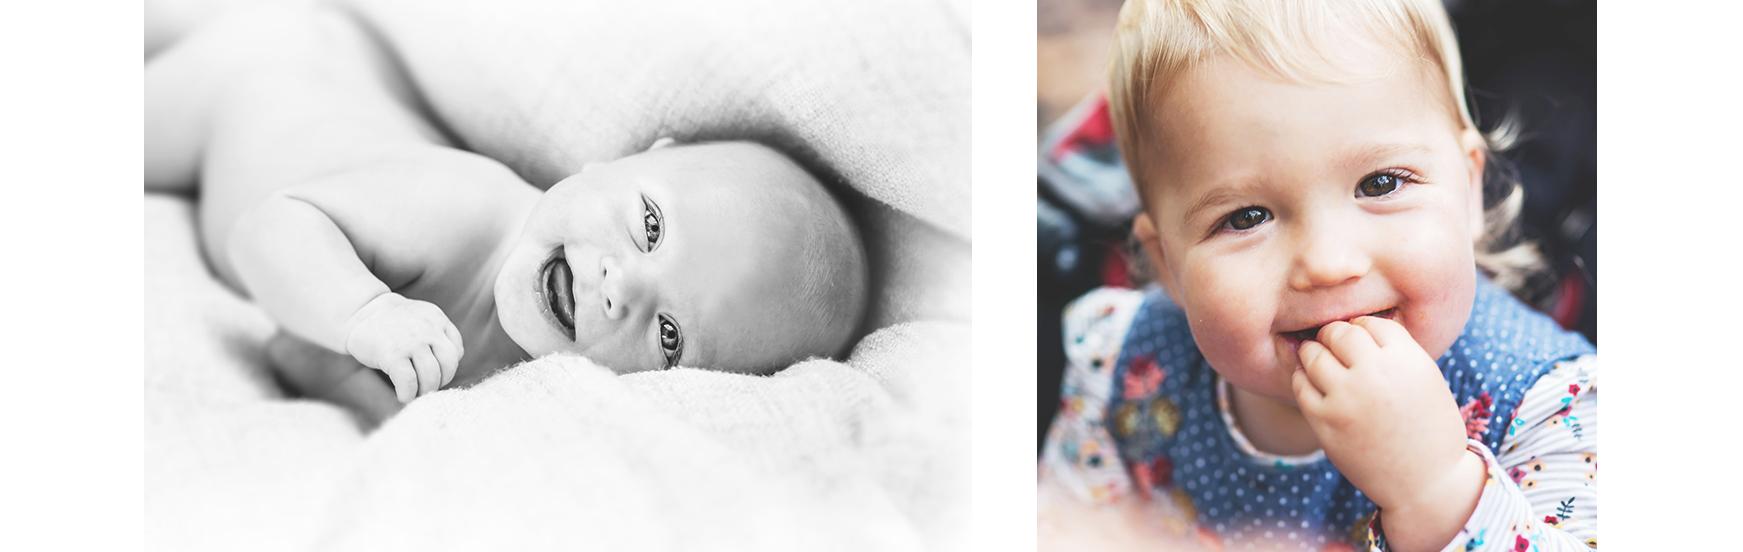 baby photographer bristol bath cheltenham